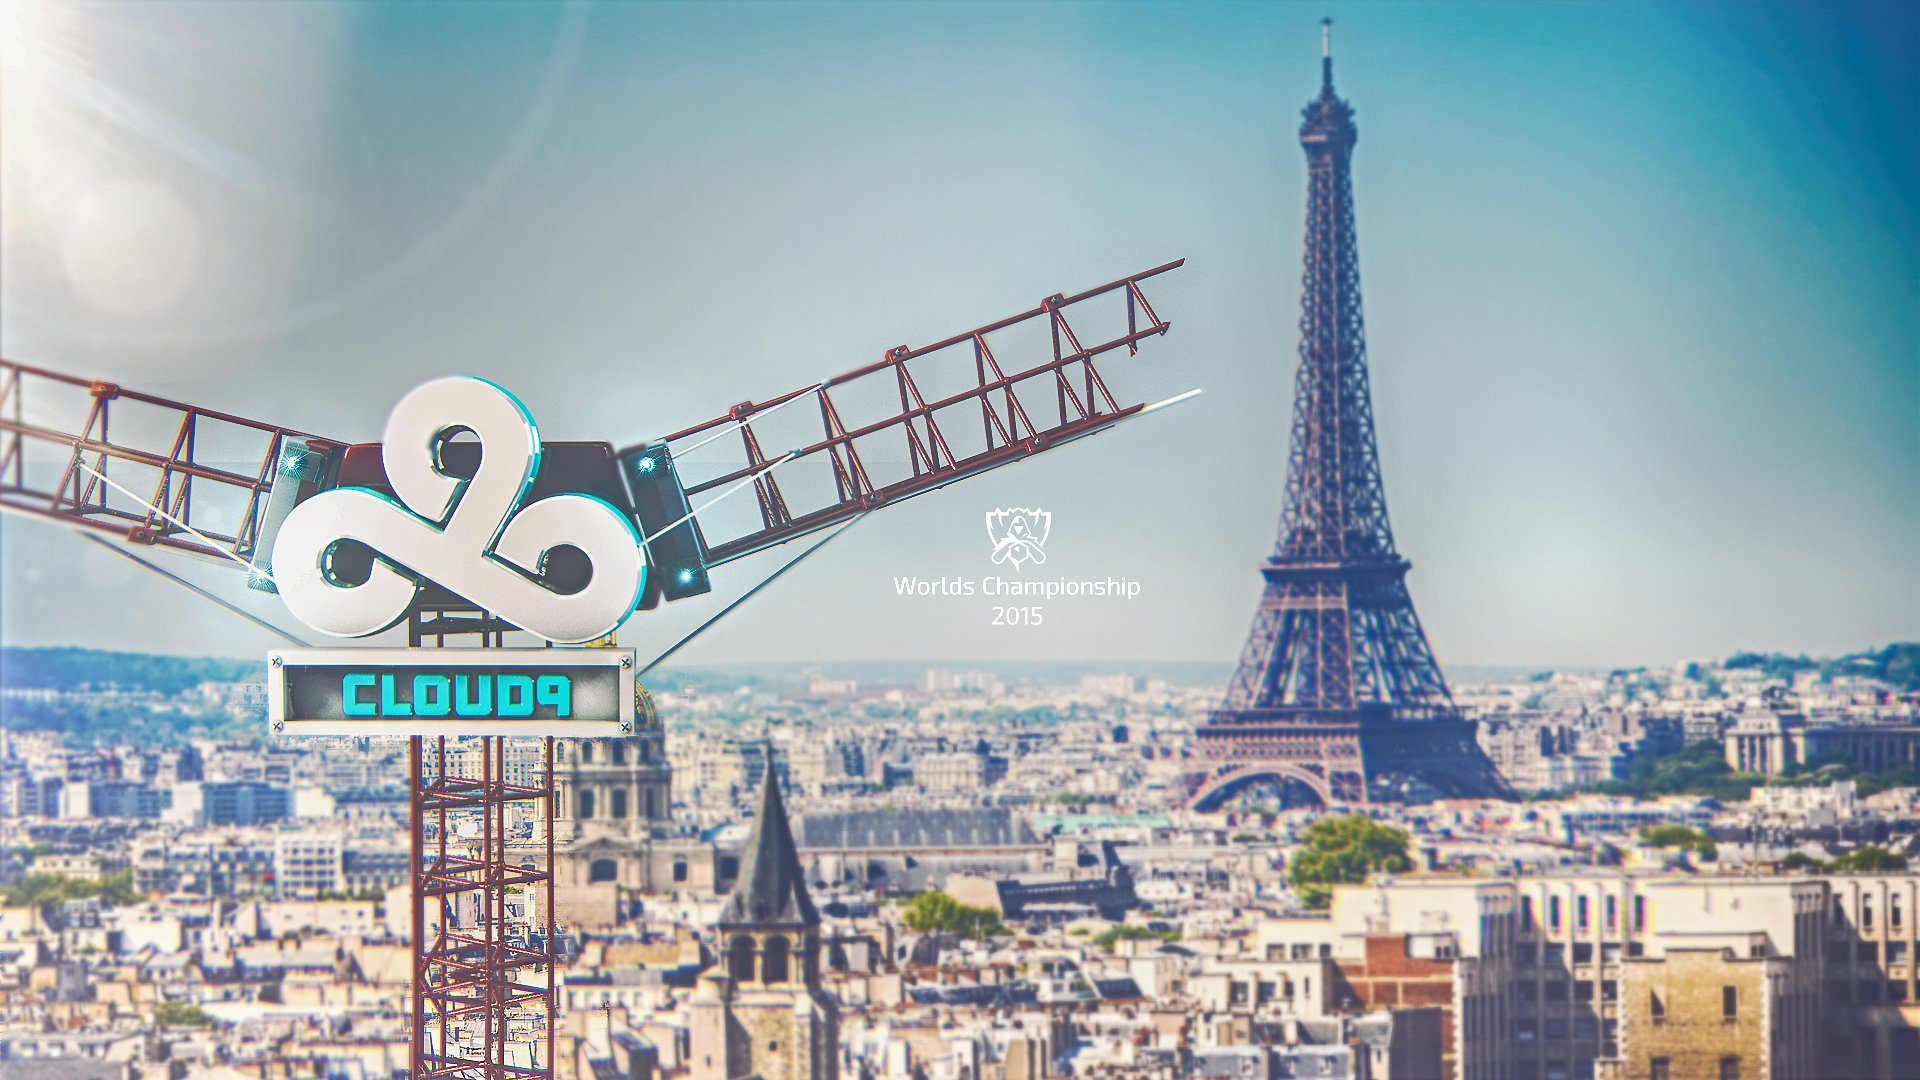 Esport Wallpaper Android: Cloud 9 - Worlds 2015 HD Wallpaper